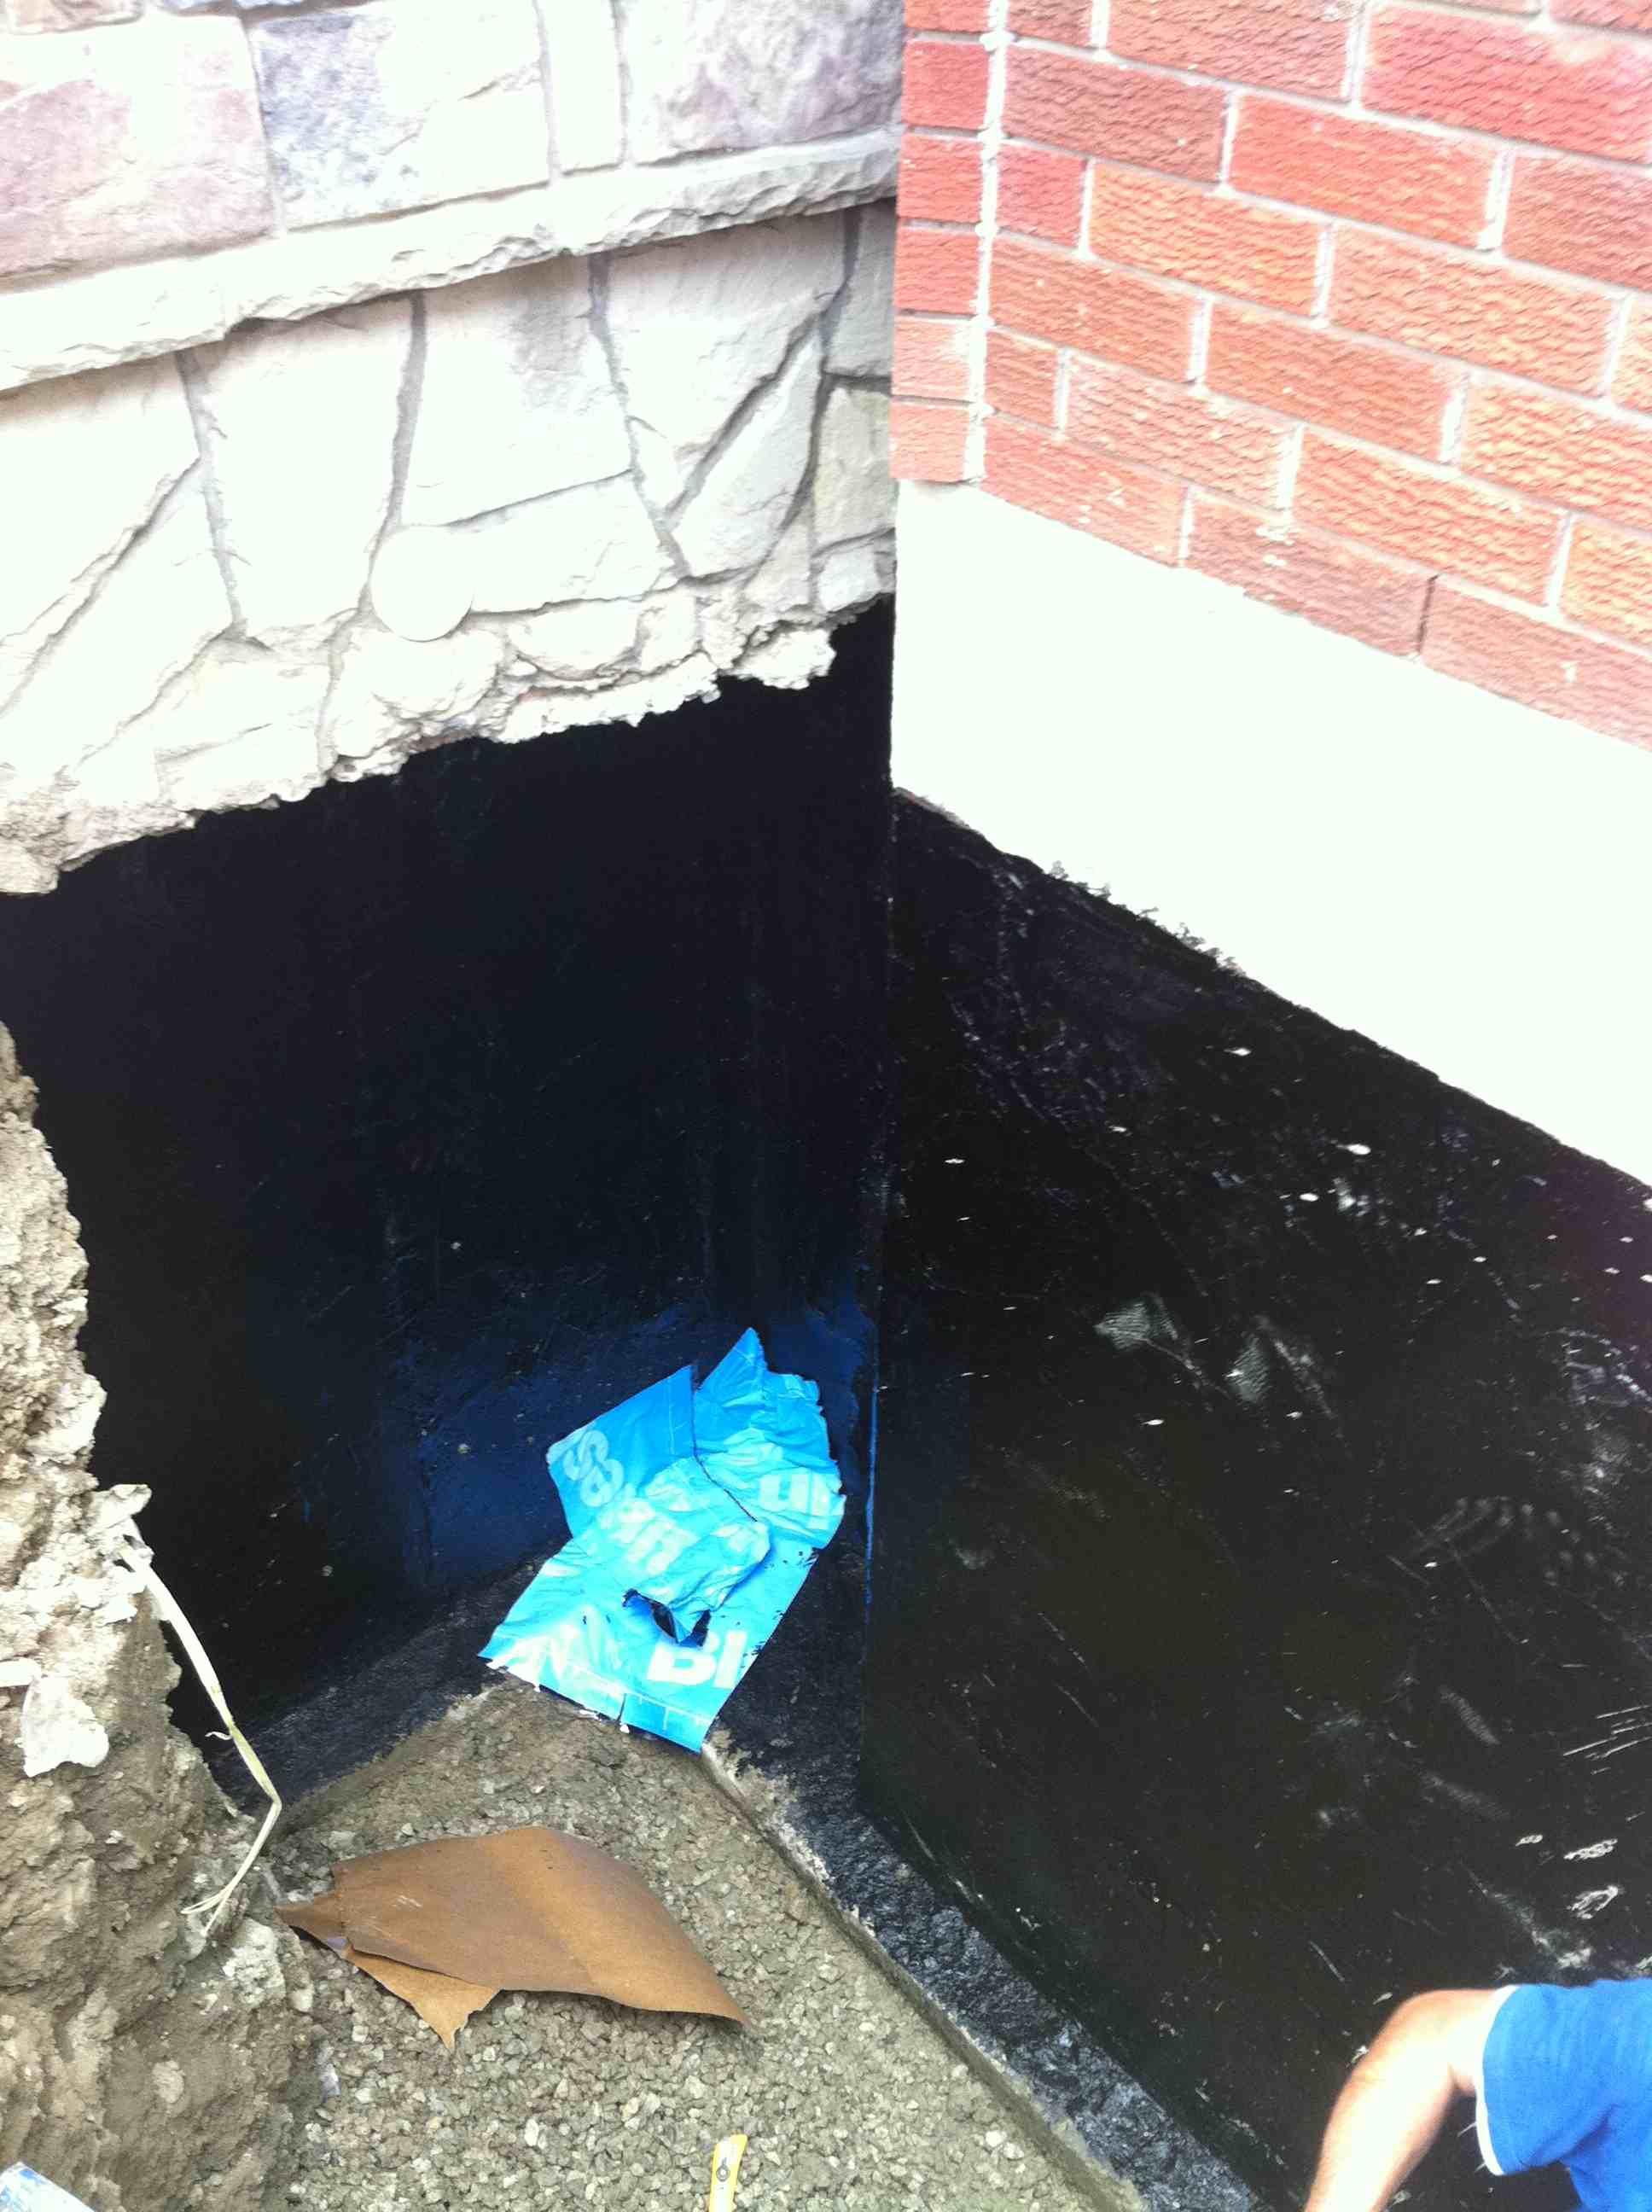 Waterproofing drainrooter plumbing Exterior basement waterproofing